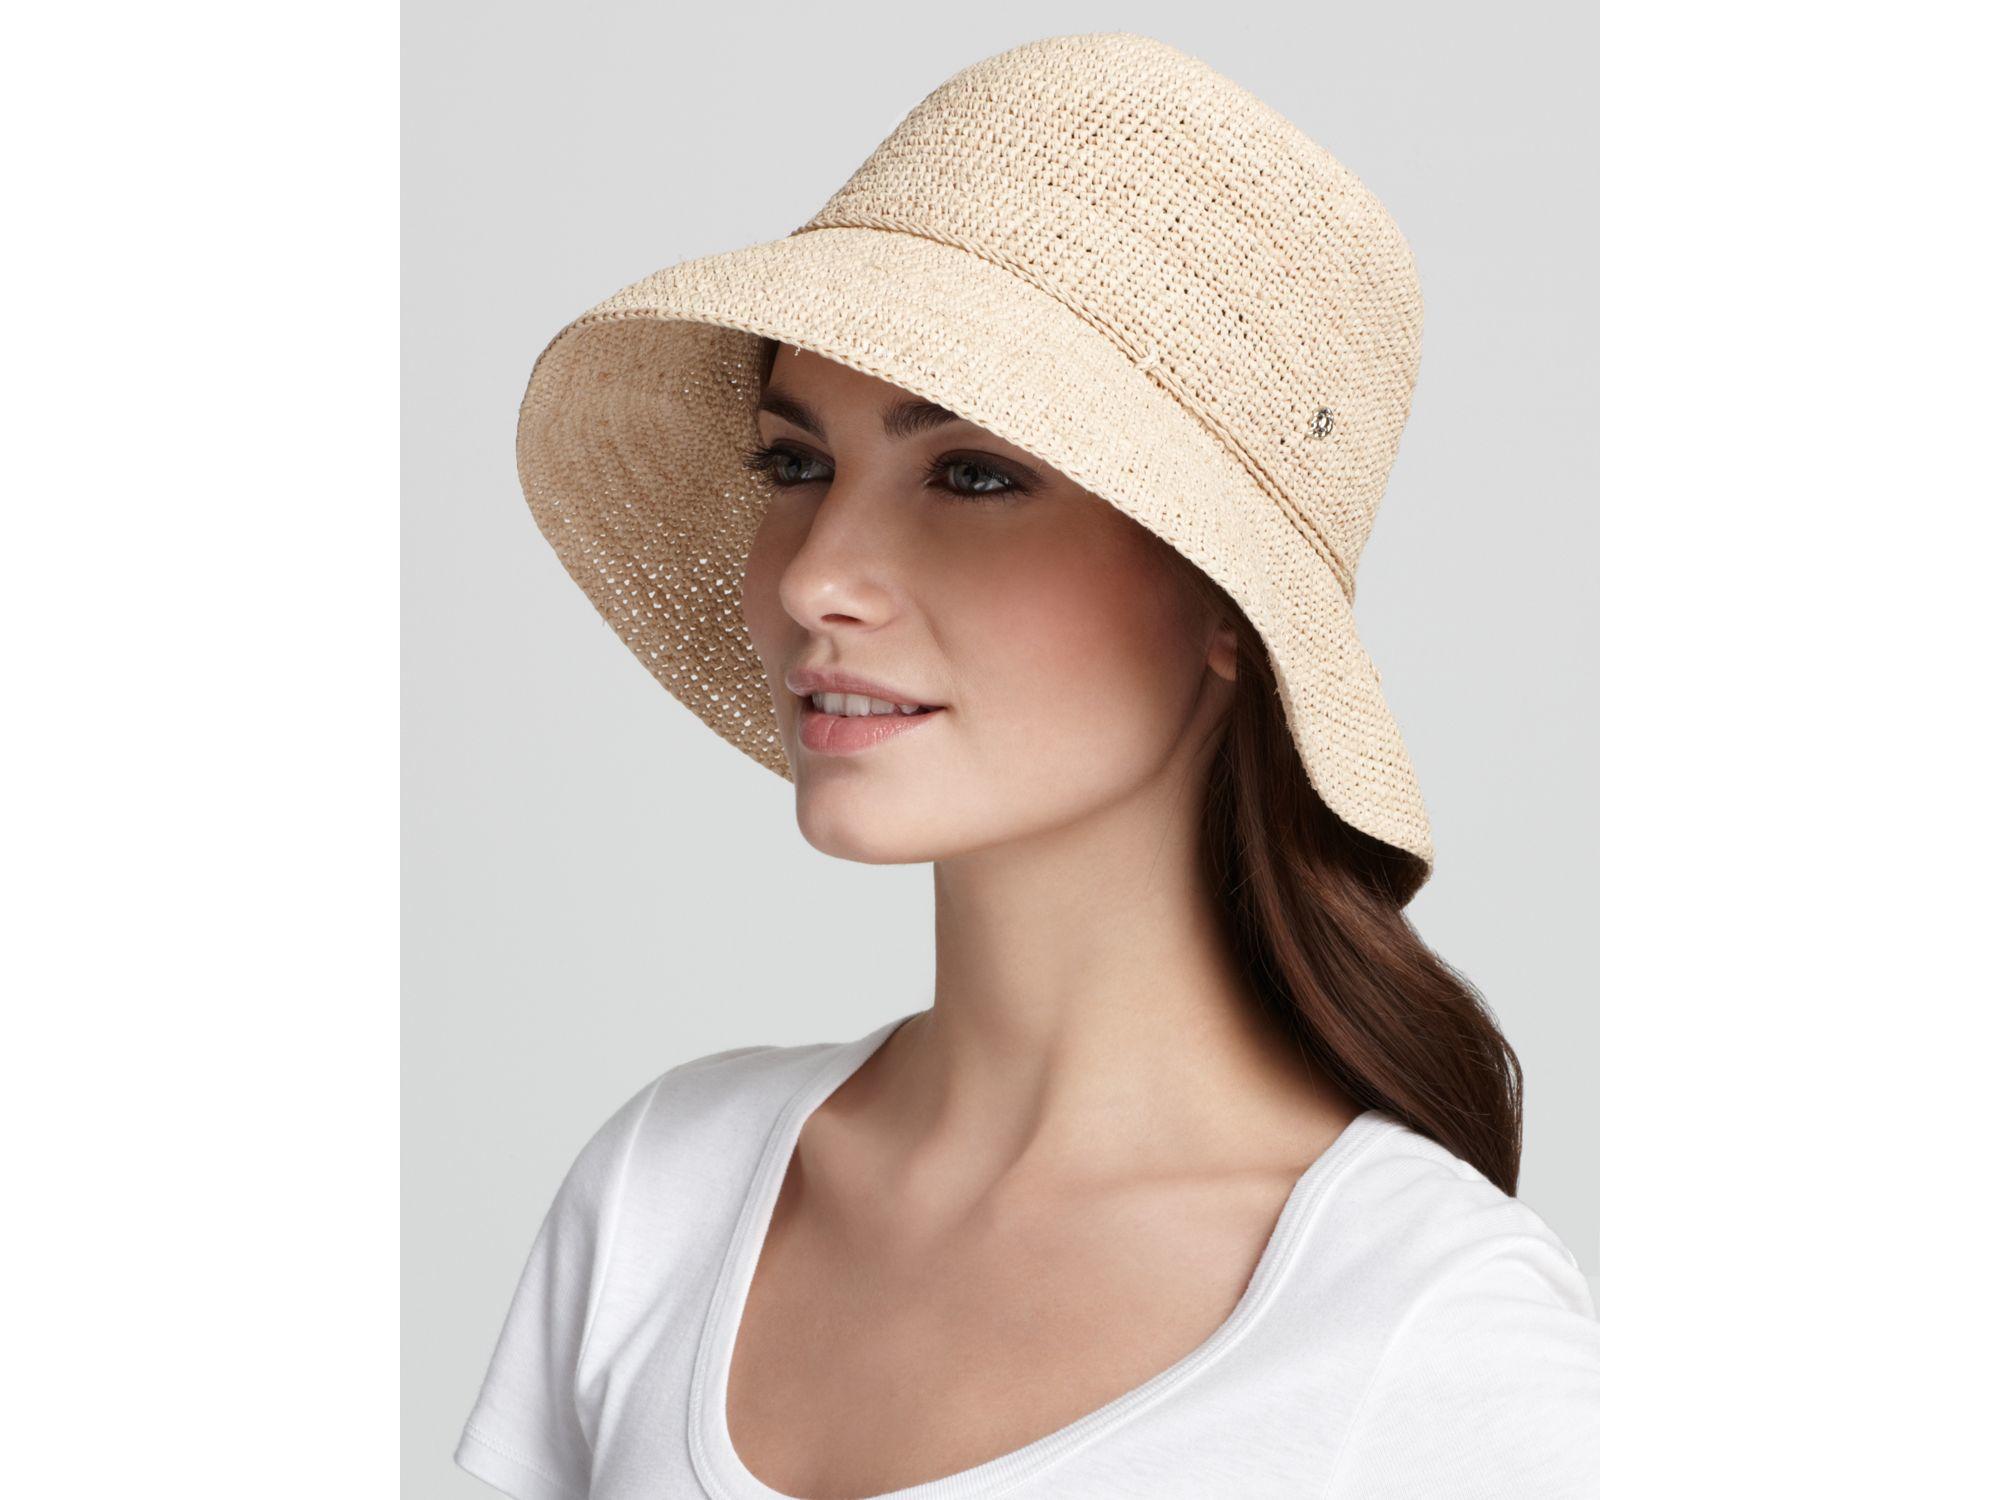 Lyst - Helen Kaminski Provence 8 Raffia Hat in Natural eefdc6791b10